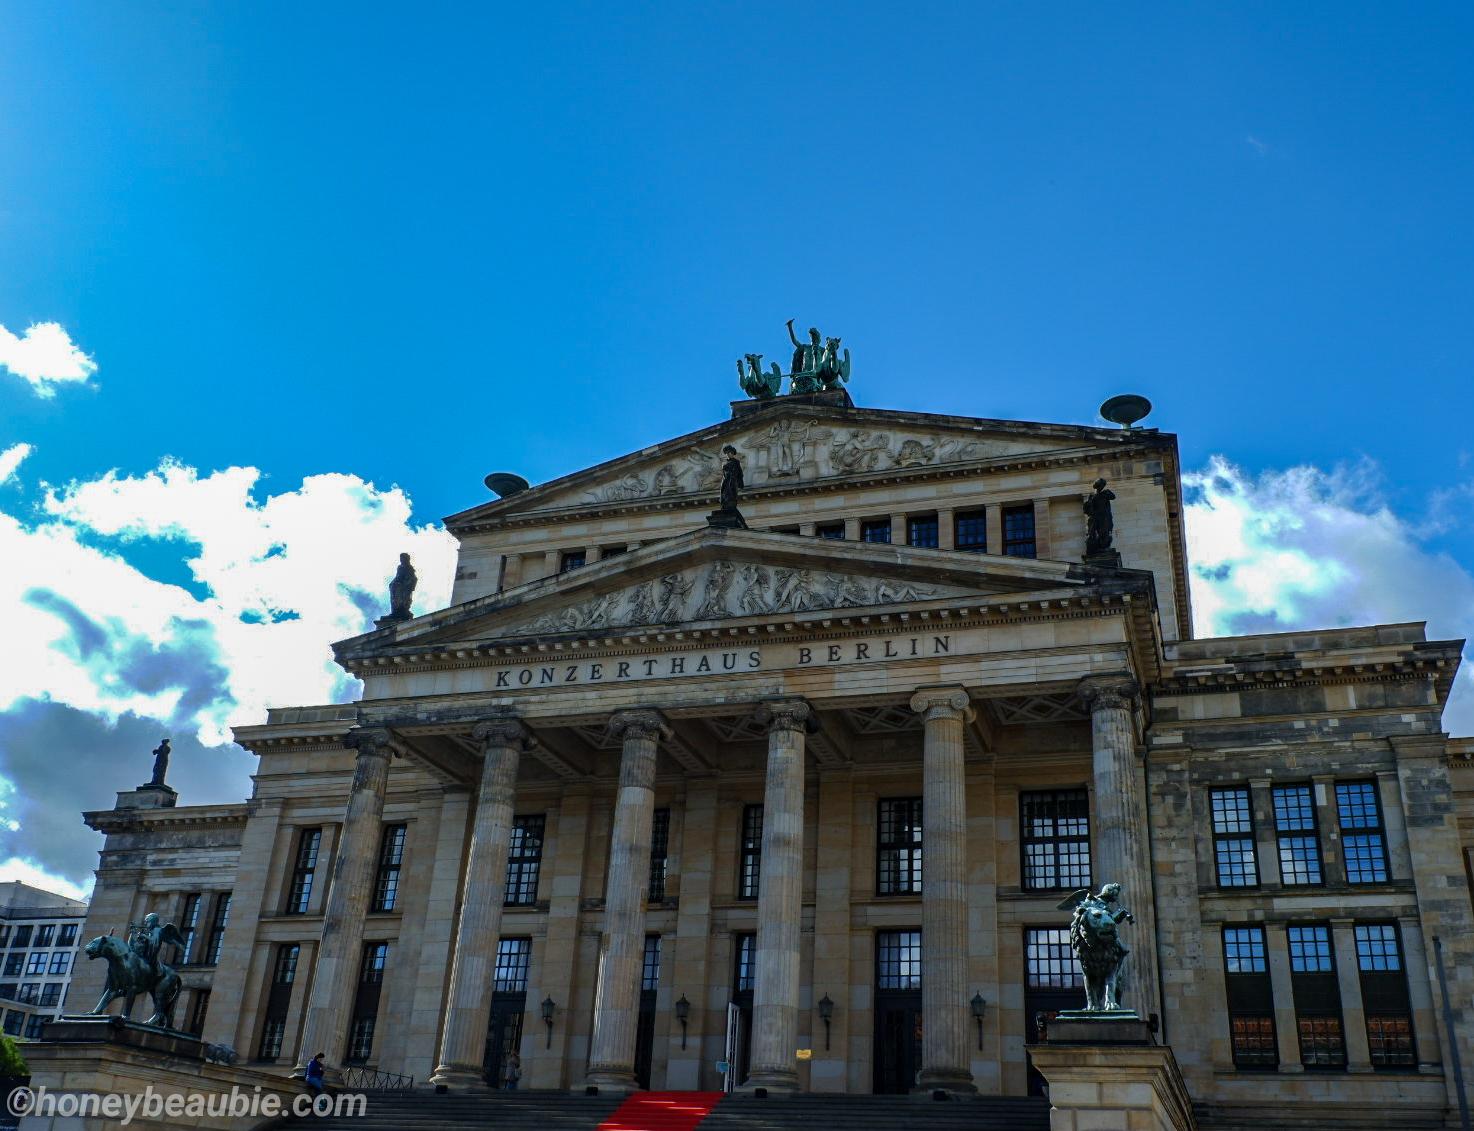 konzerthaus-in-berlin-symphony-orchestra